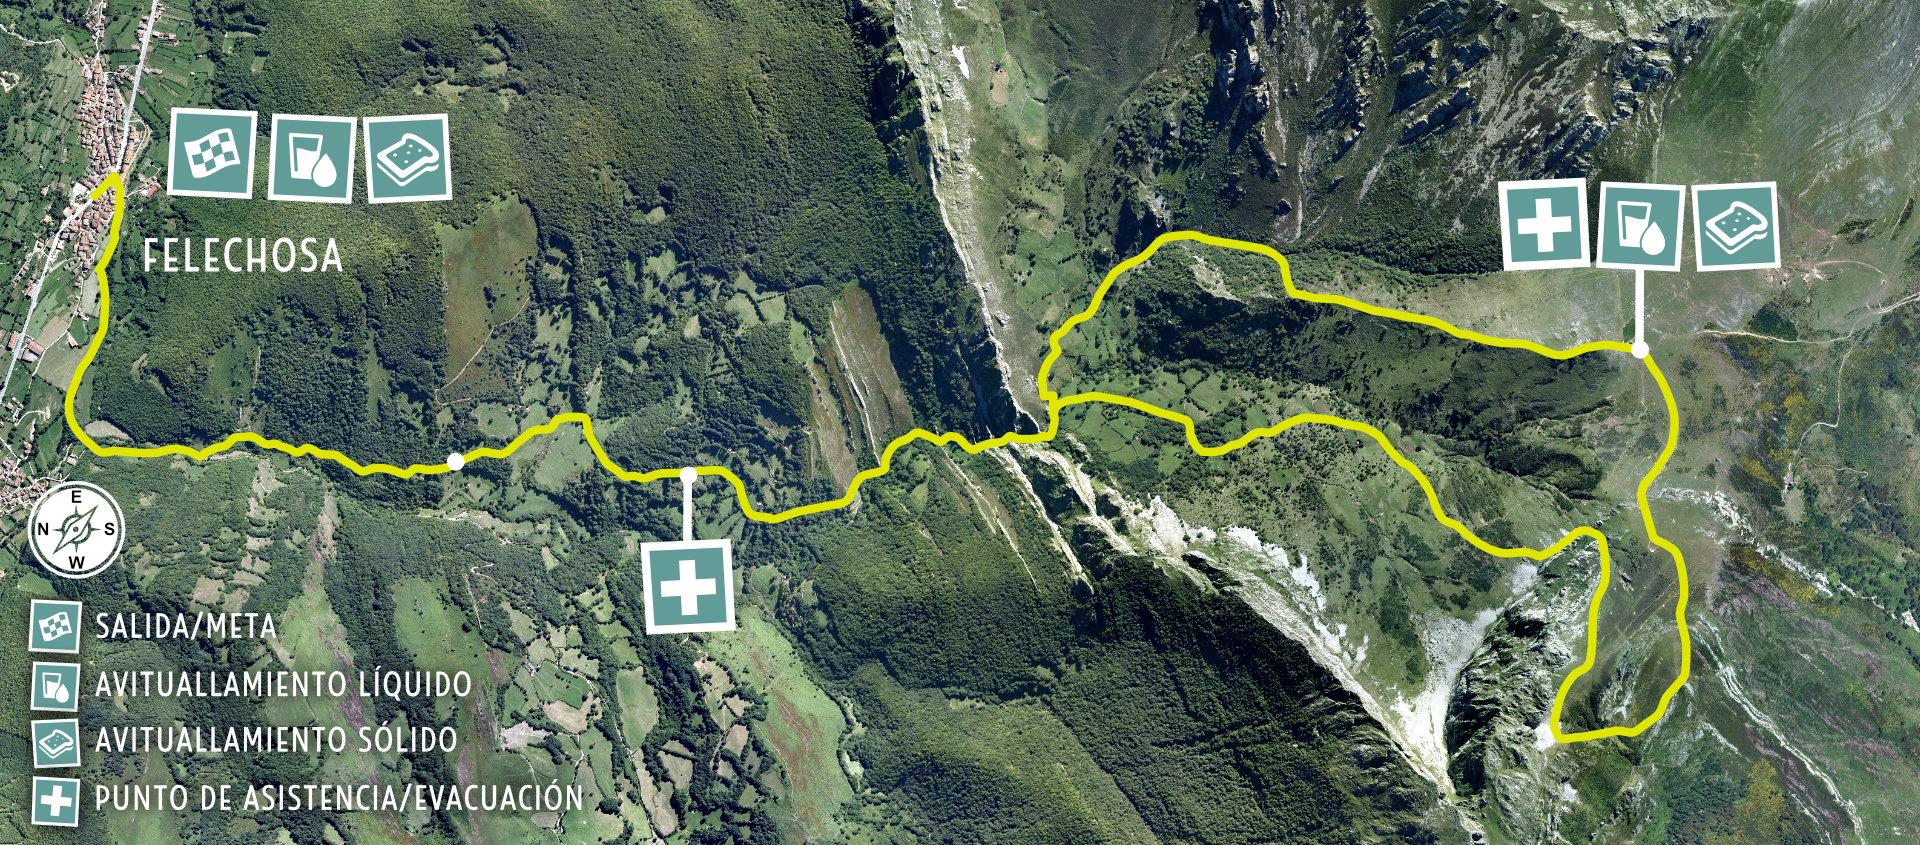 K15 Mapa de Carrera